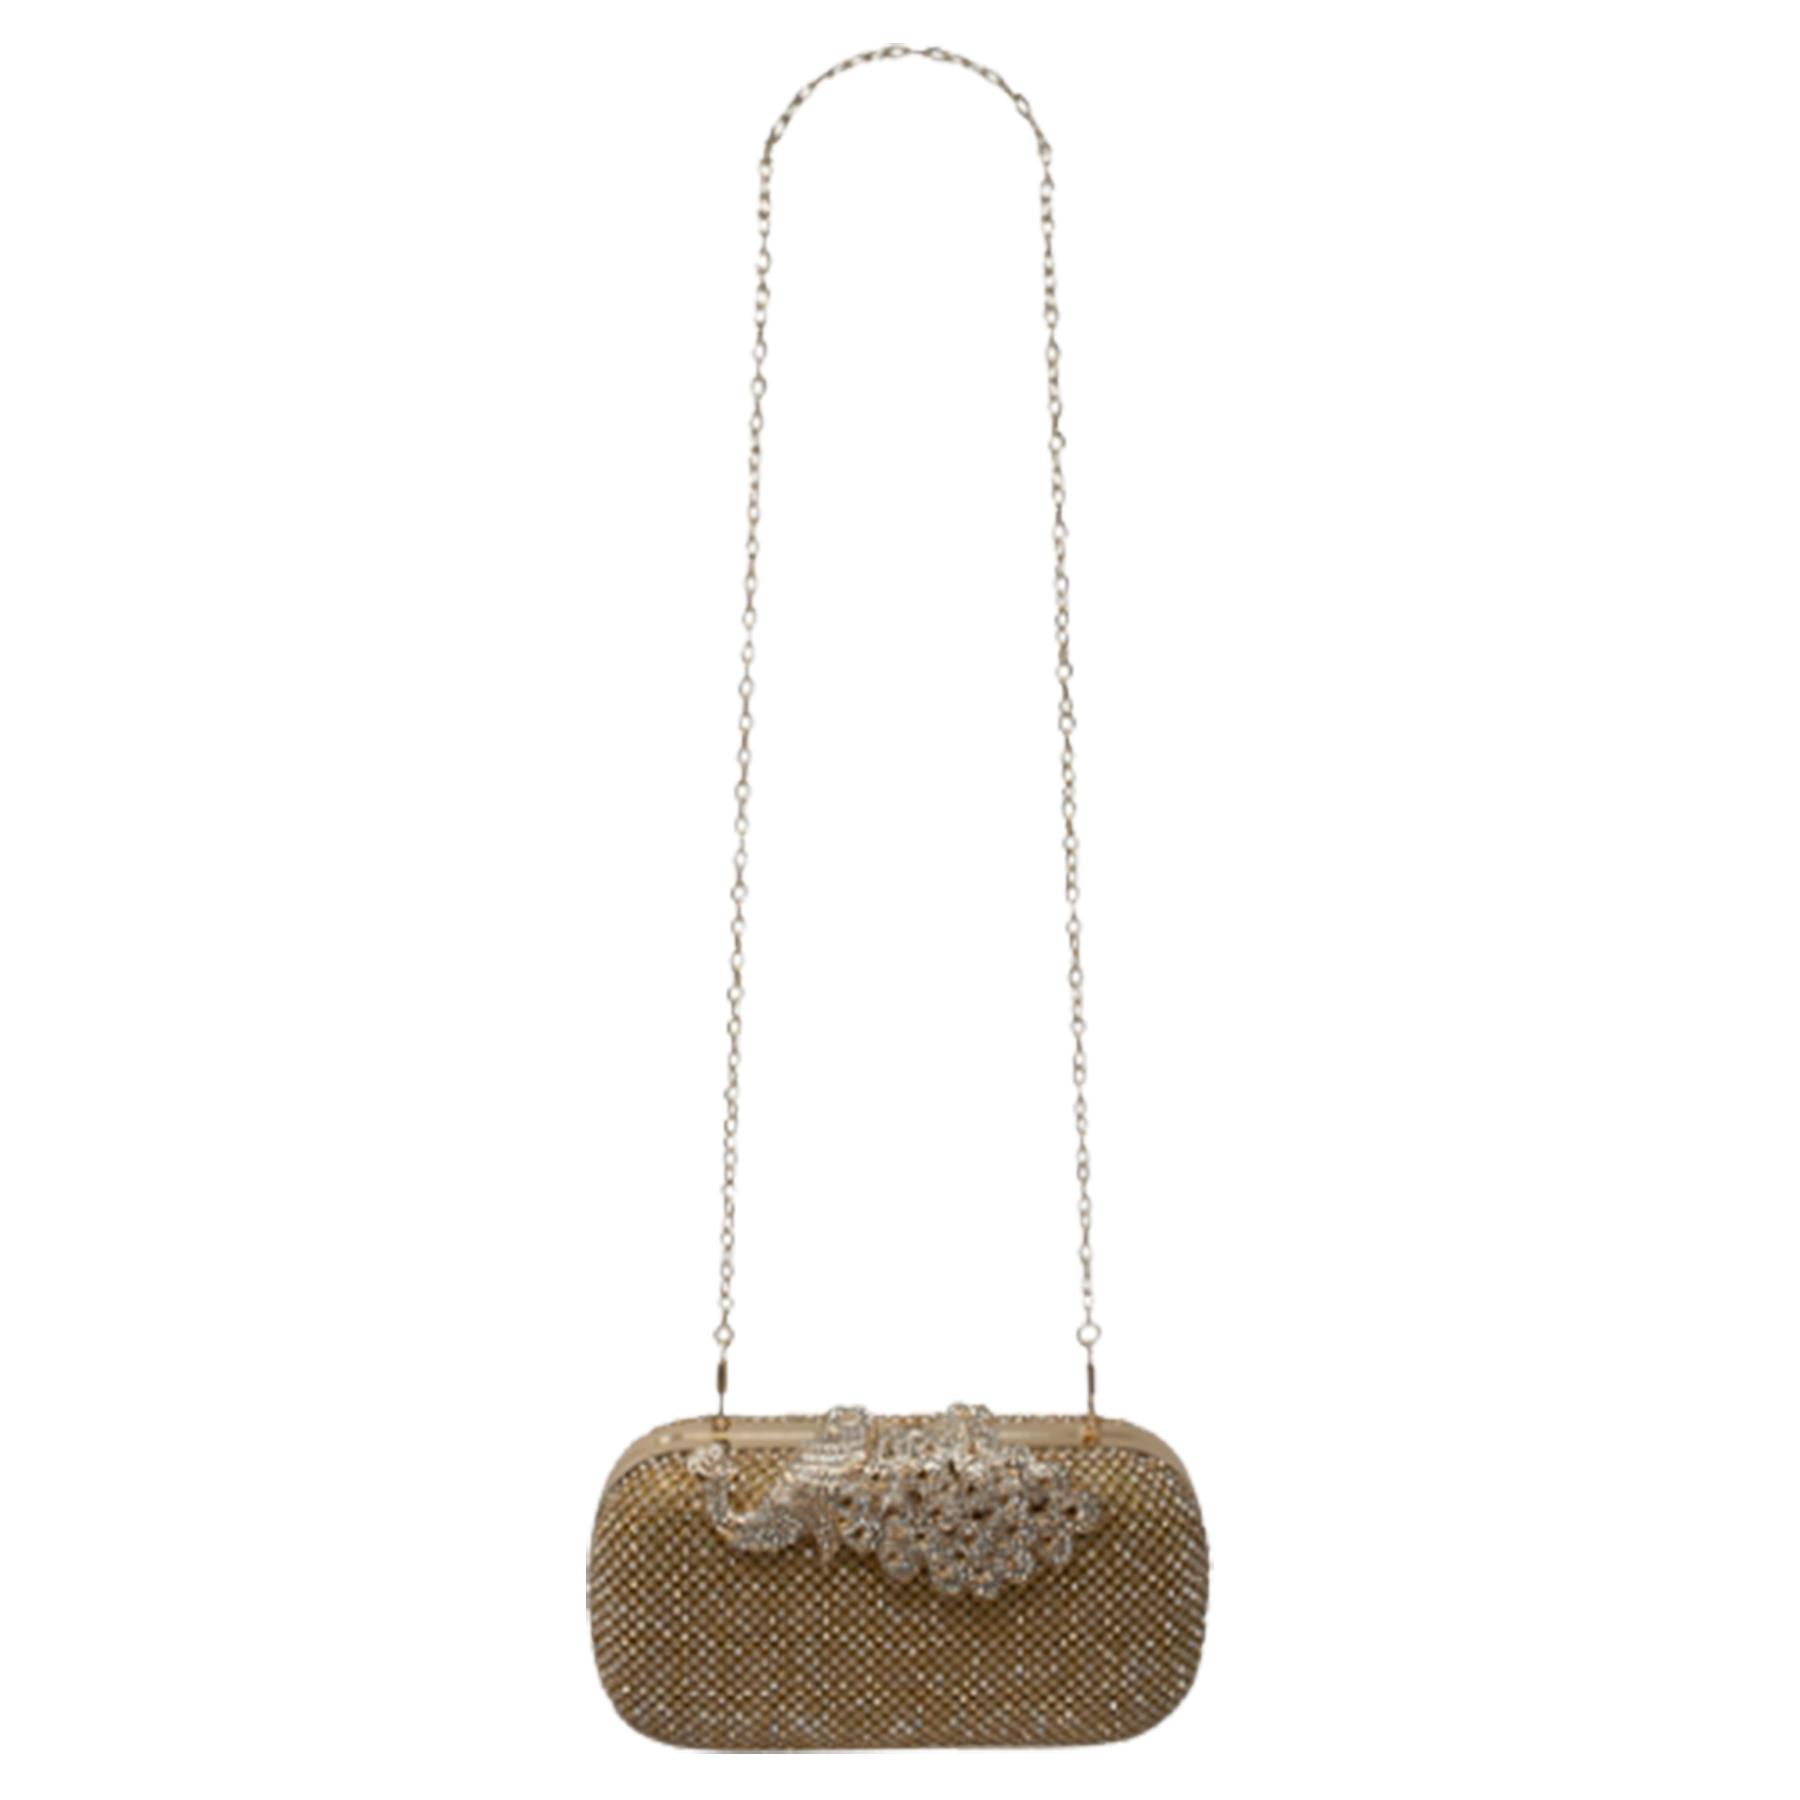 New-Women-s-Jewel-Elephant-Detail-Diamante-Chain-Box-Clutch-Bag-Purse thumbnail 11